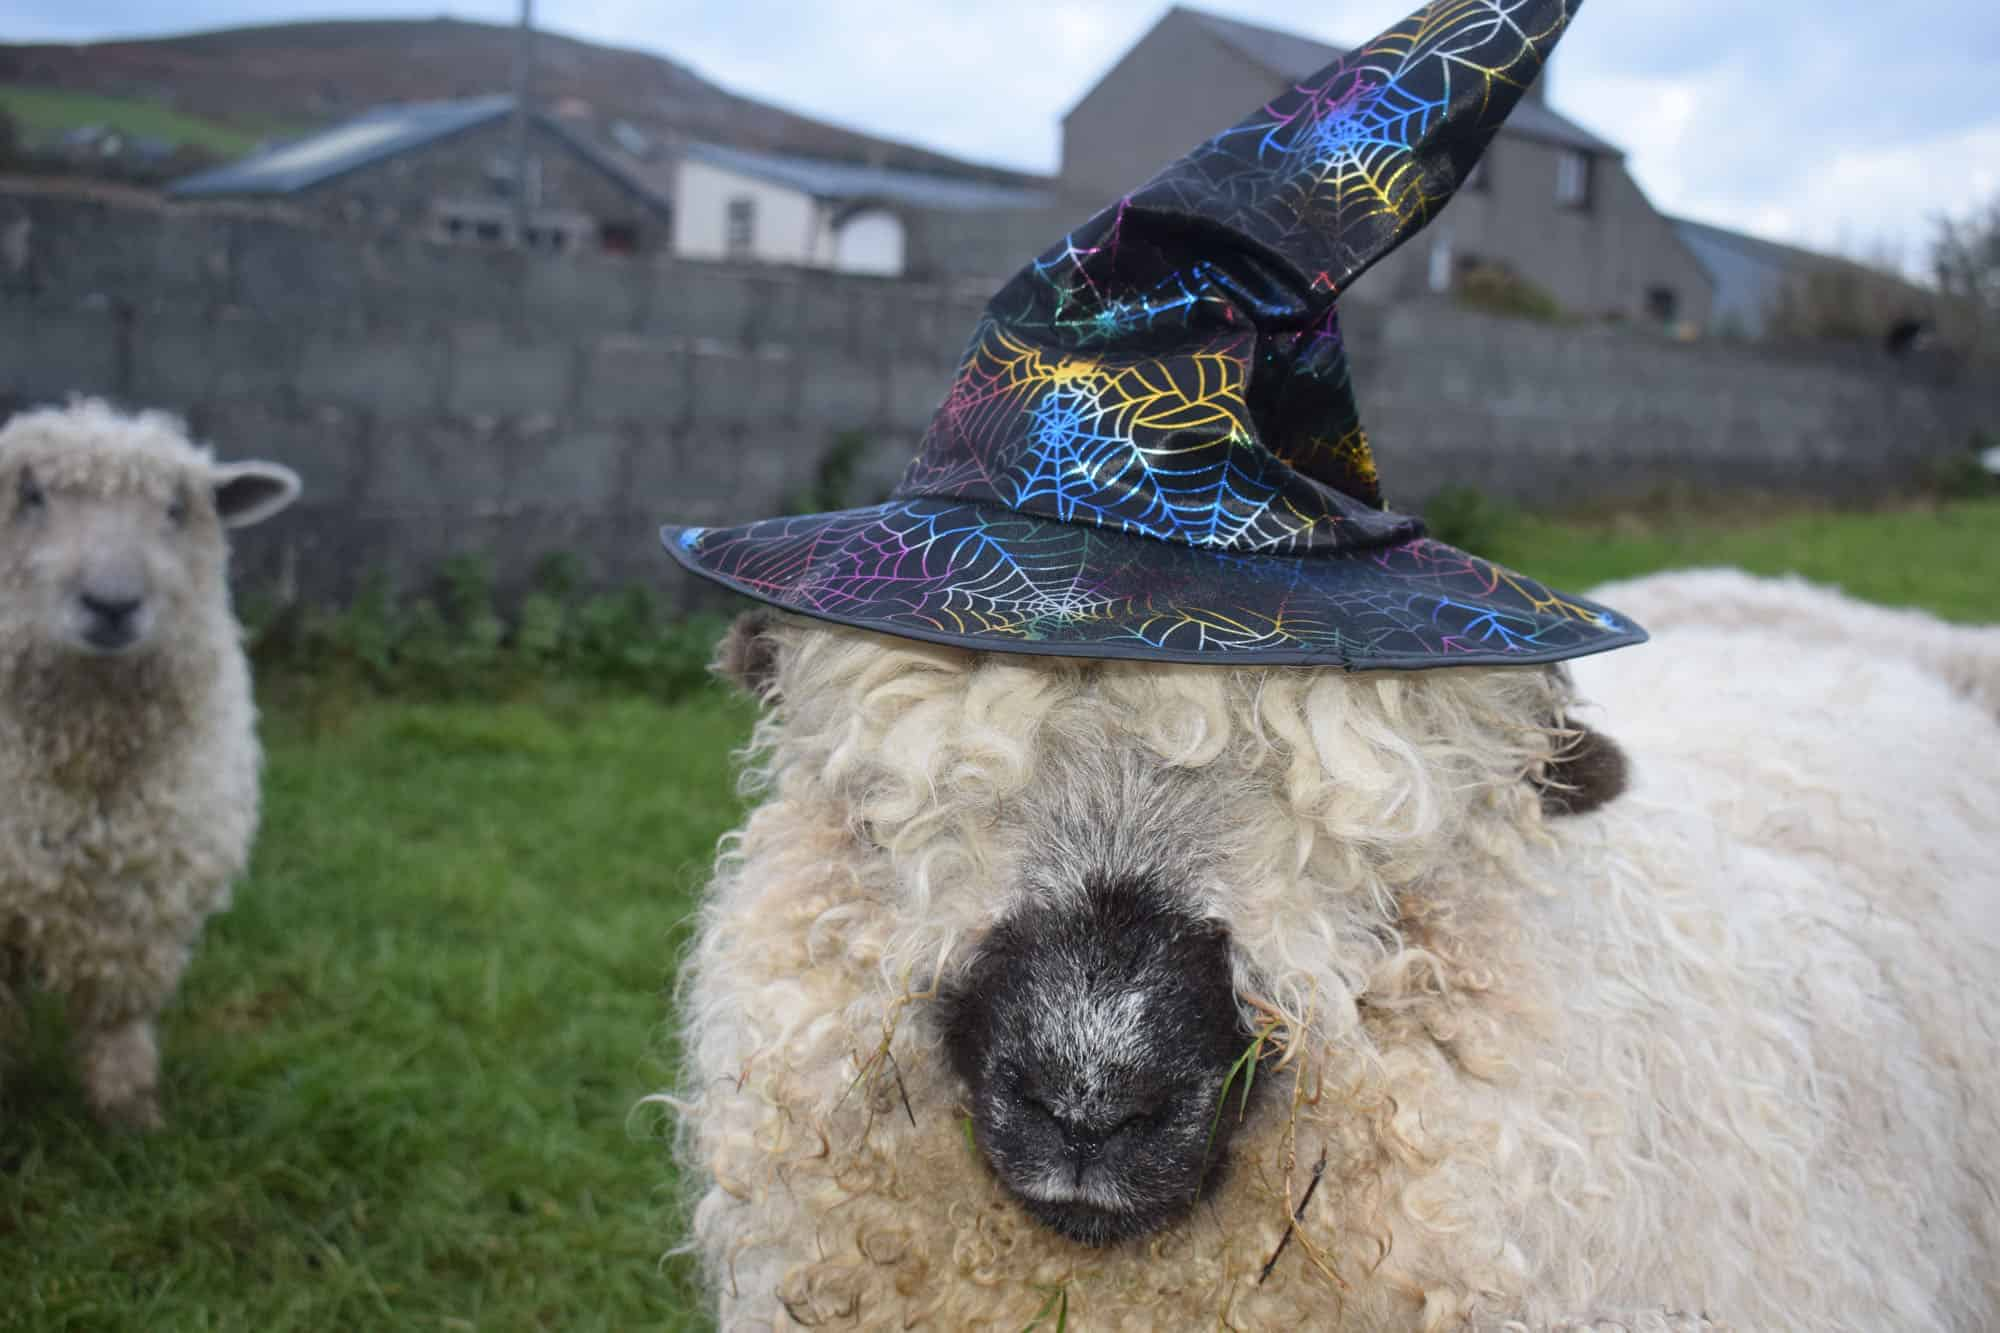 Nora valais blacknose greyface dartmoor pet sheep cuddle bear sheep patchworksheep crueltyfree felt rugs halloween